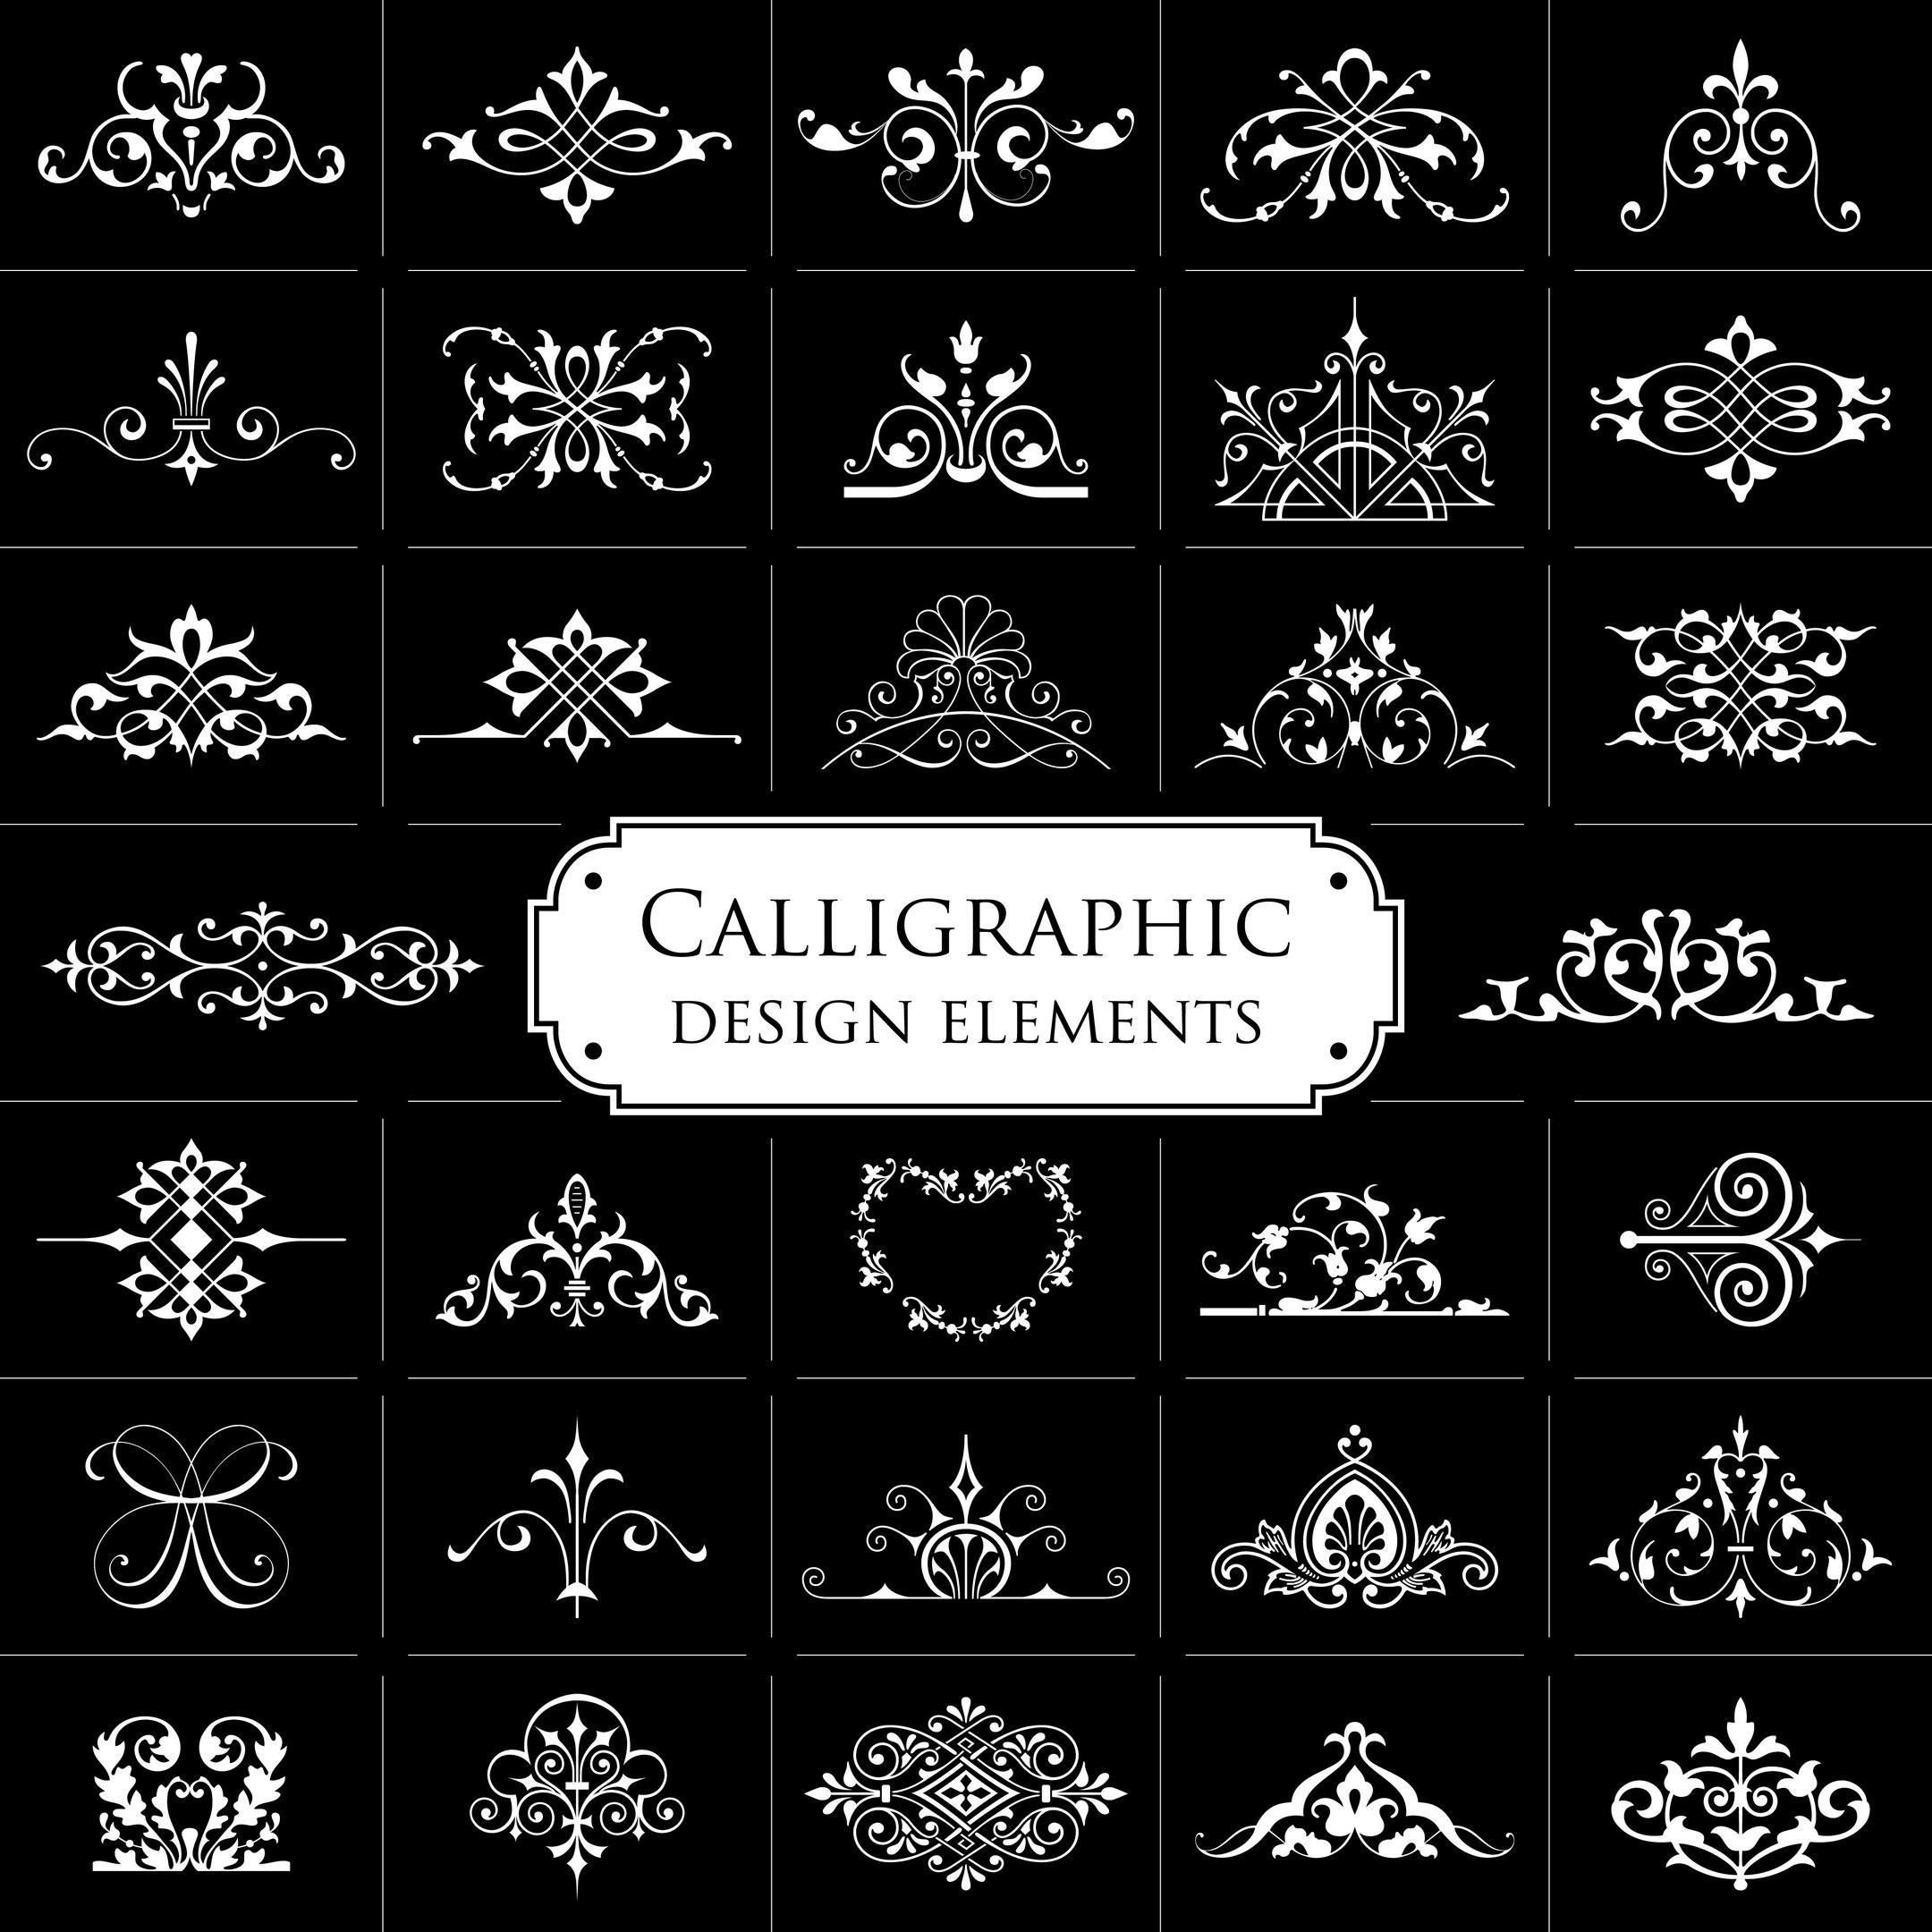 Calligraphic Design Elements Set Free Vector